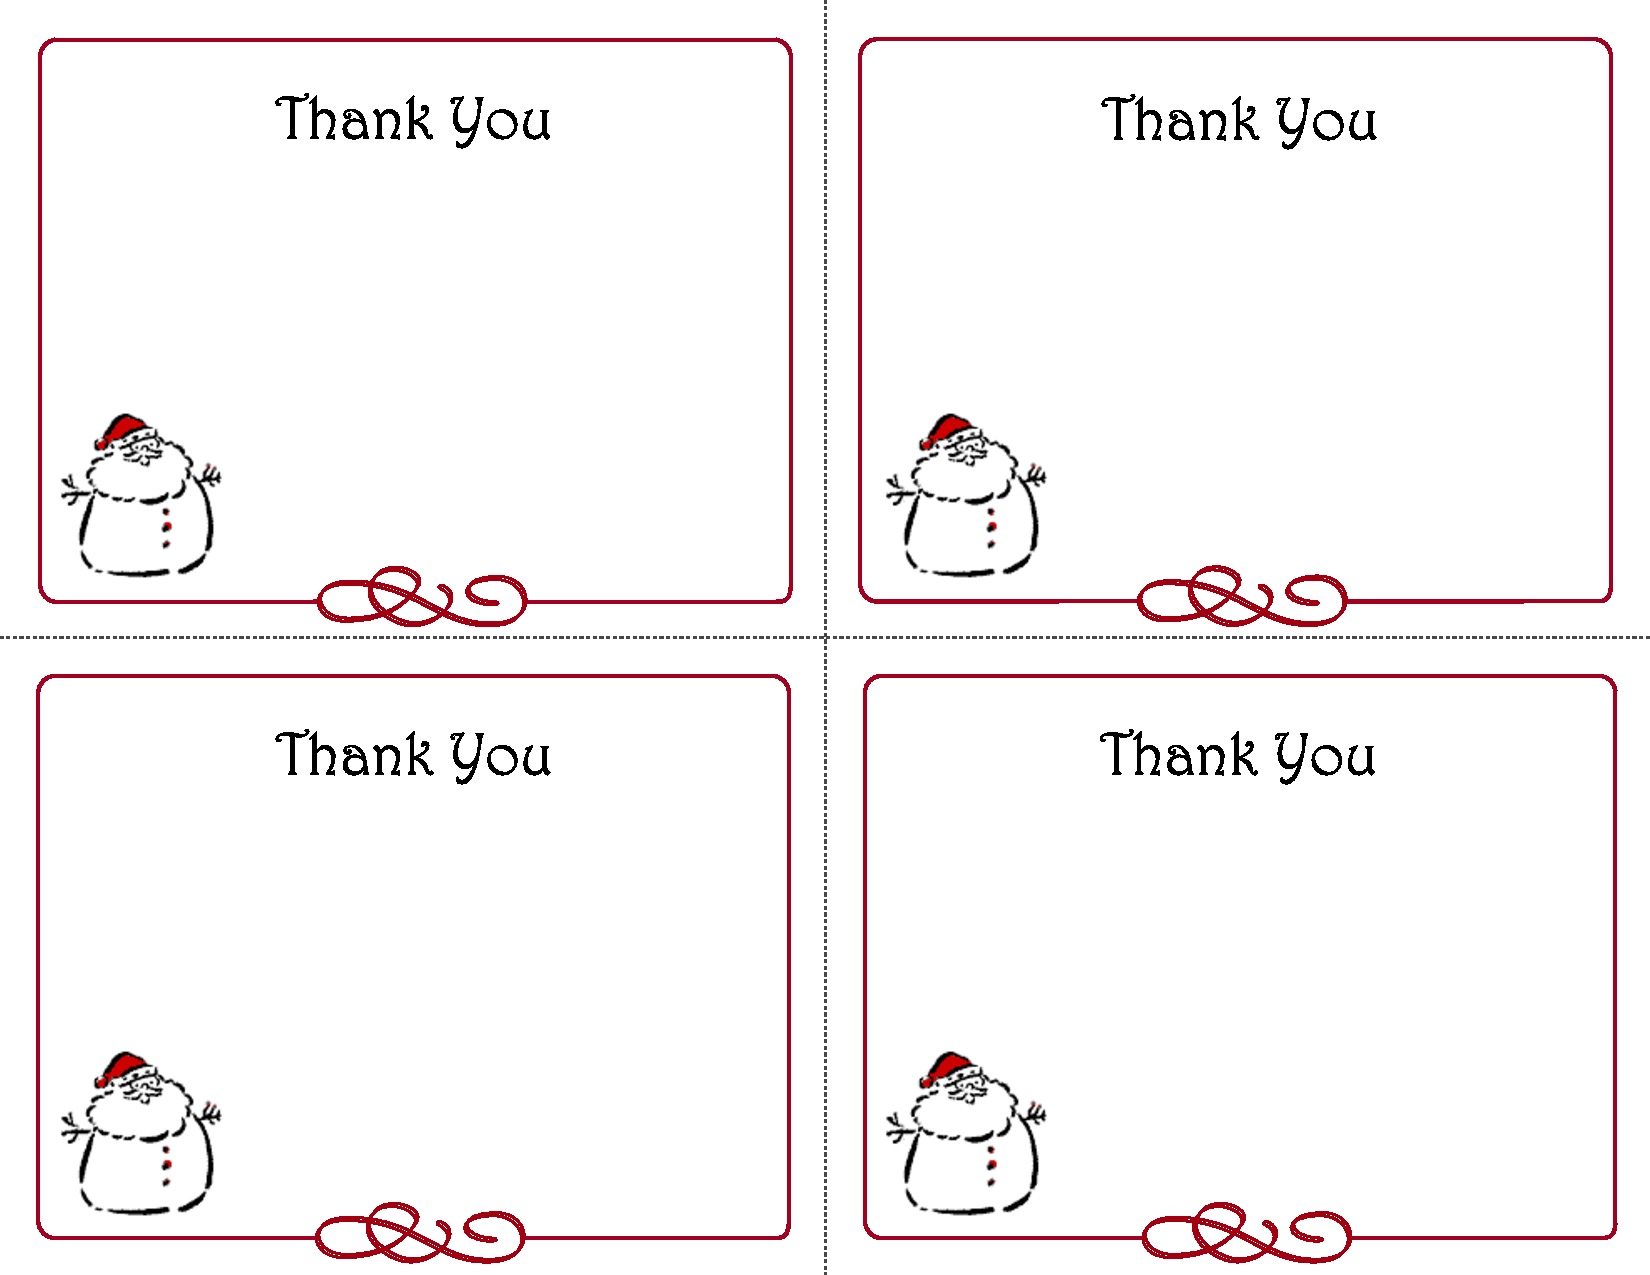 Free Thank You Cards Printable   Free Printable Holiday Gift Tags - Christmas Thank You Cards Printable Free